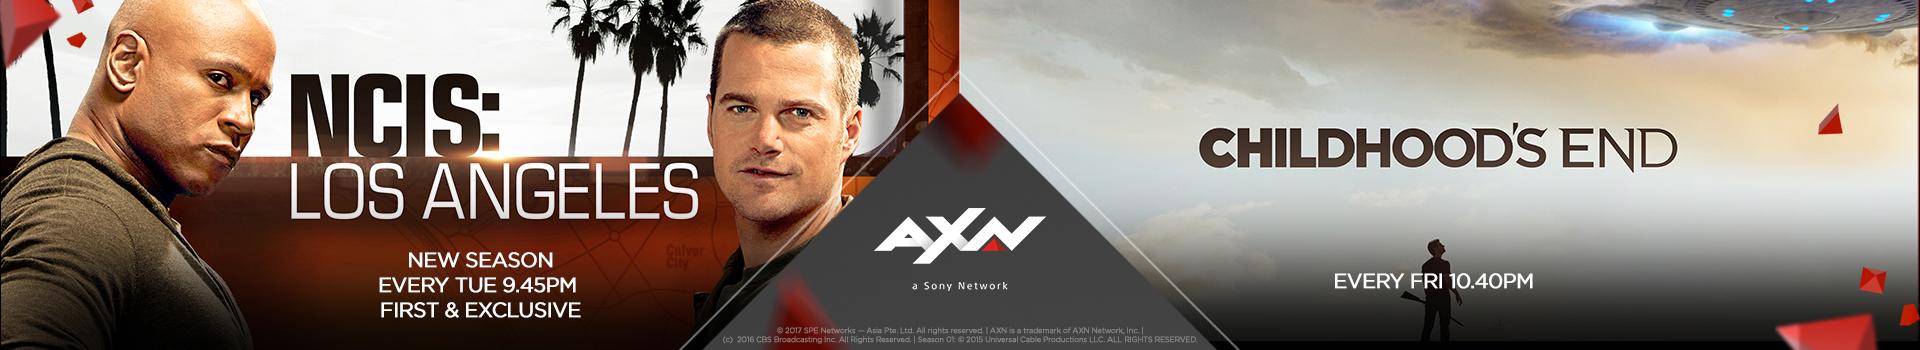 AXN Channel, Serve